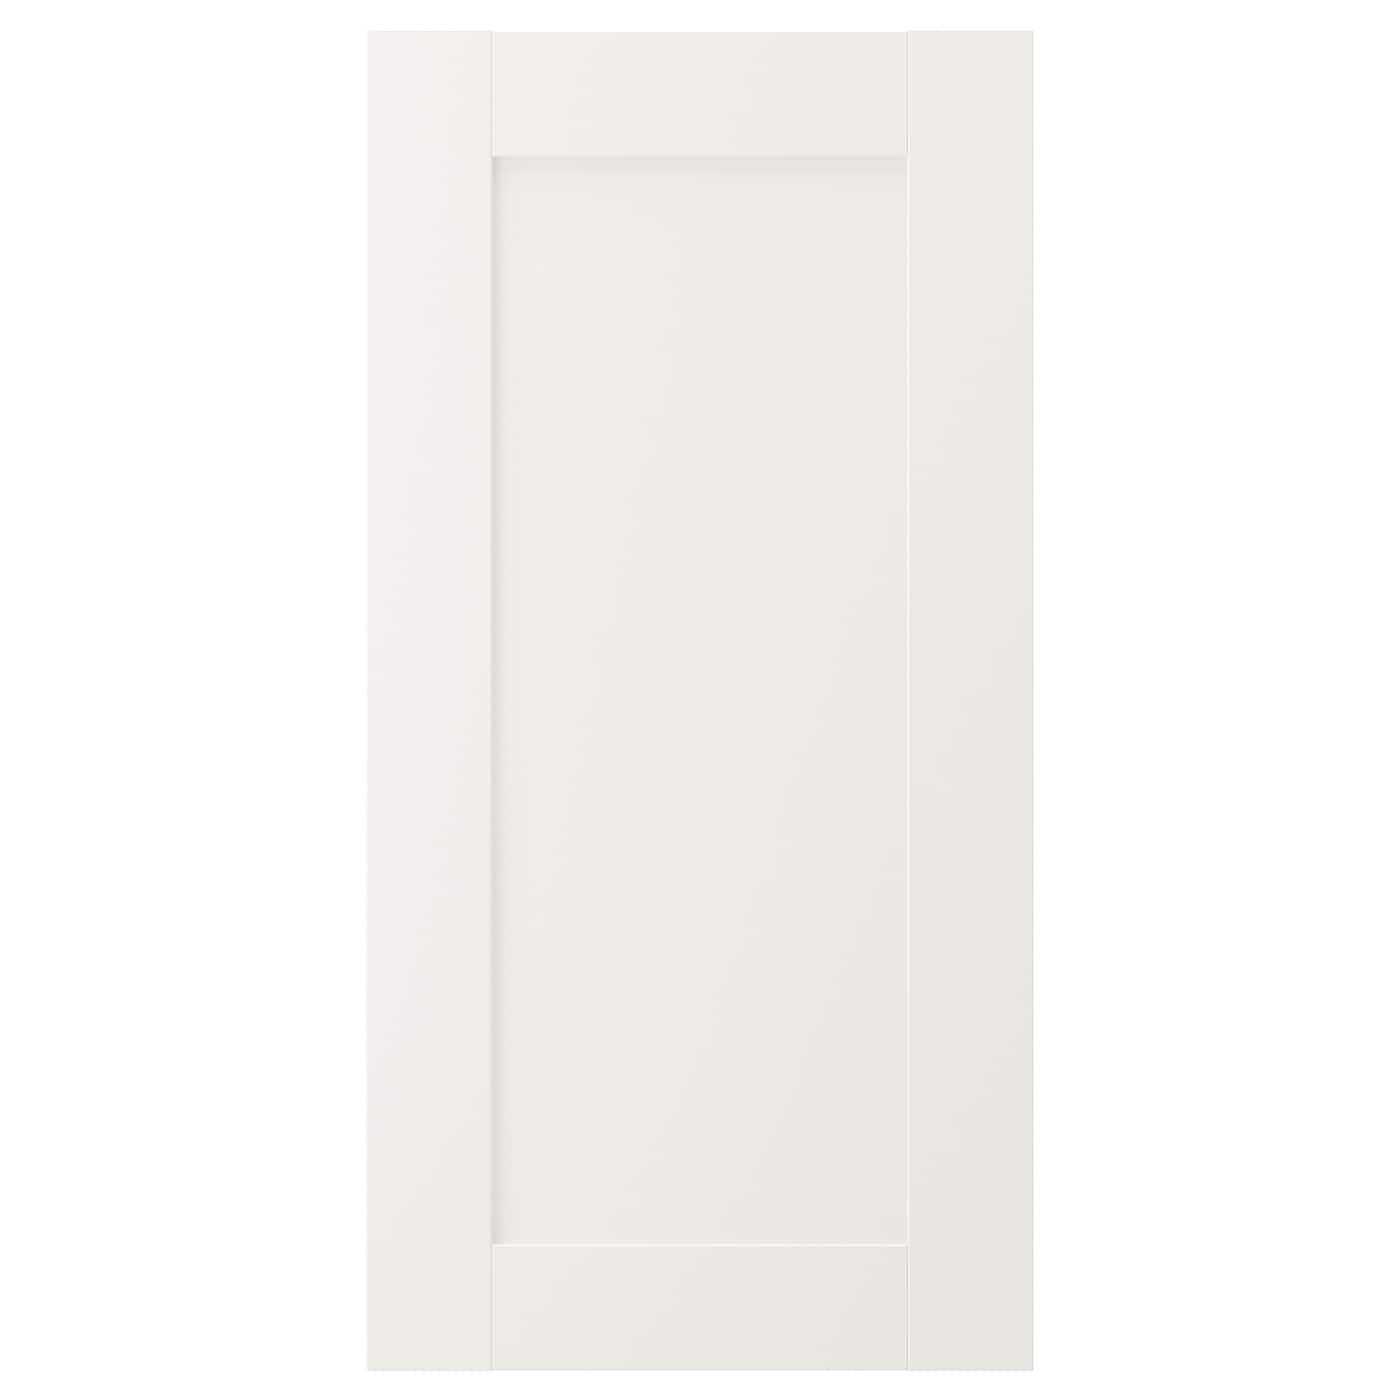 Savedal Puerta Blanco 40 X 80 Cm Ikea